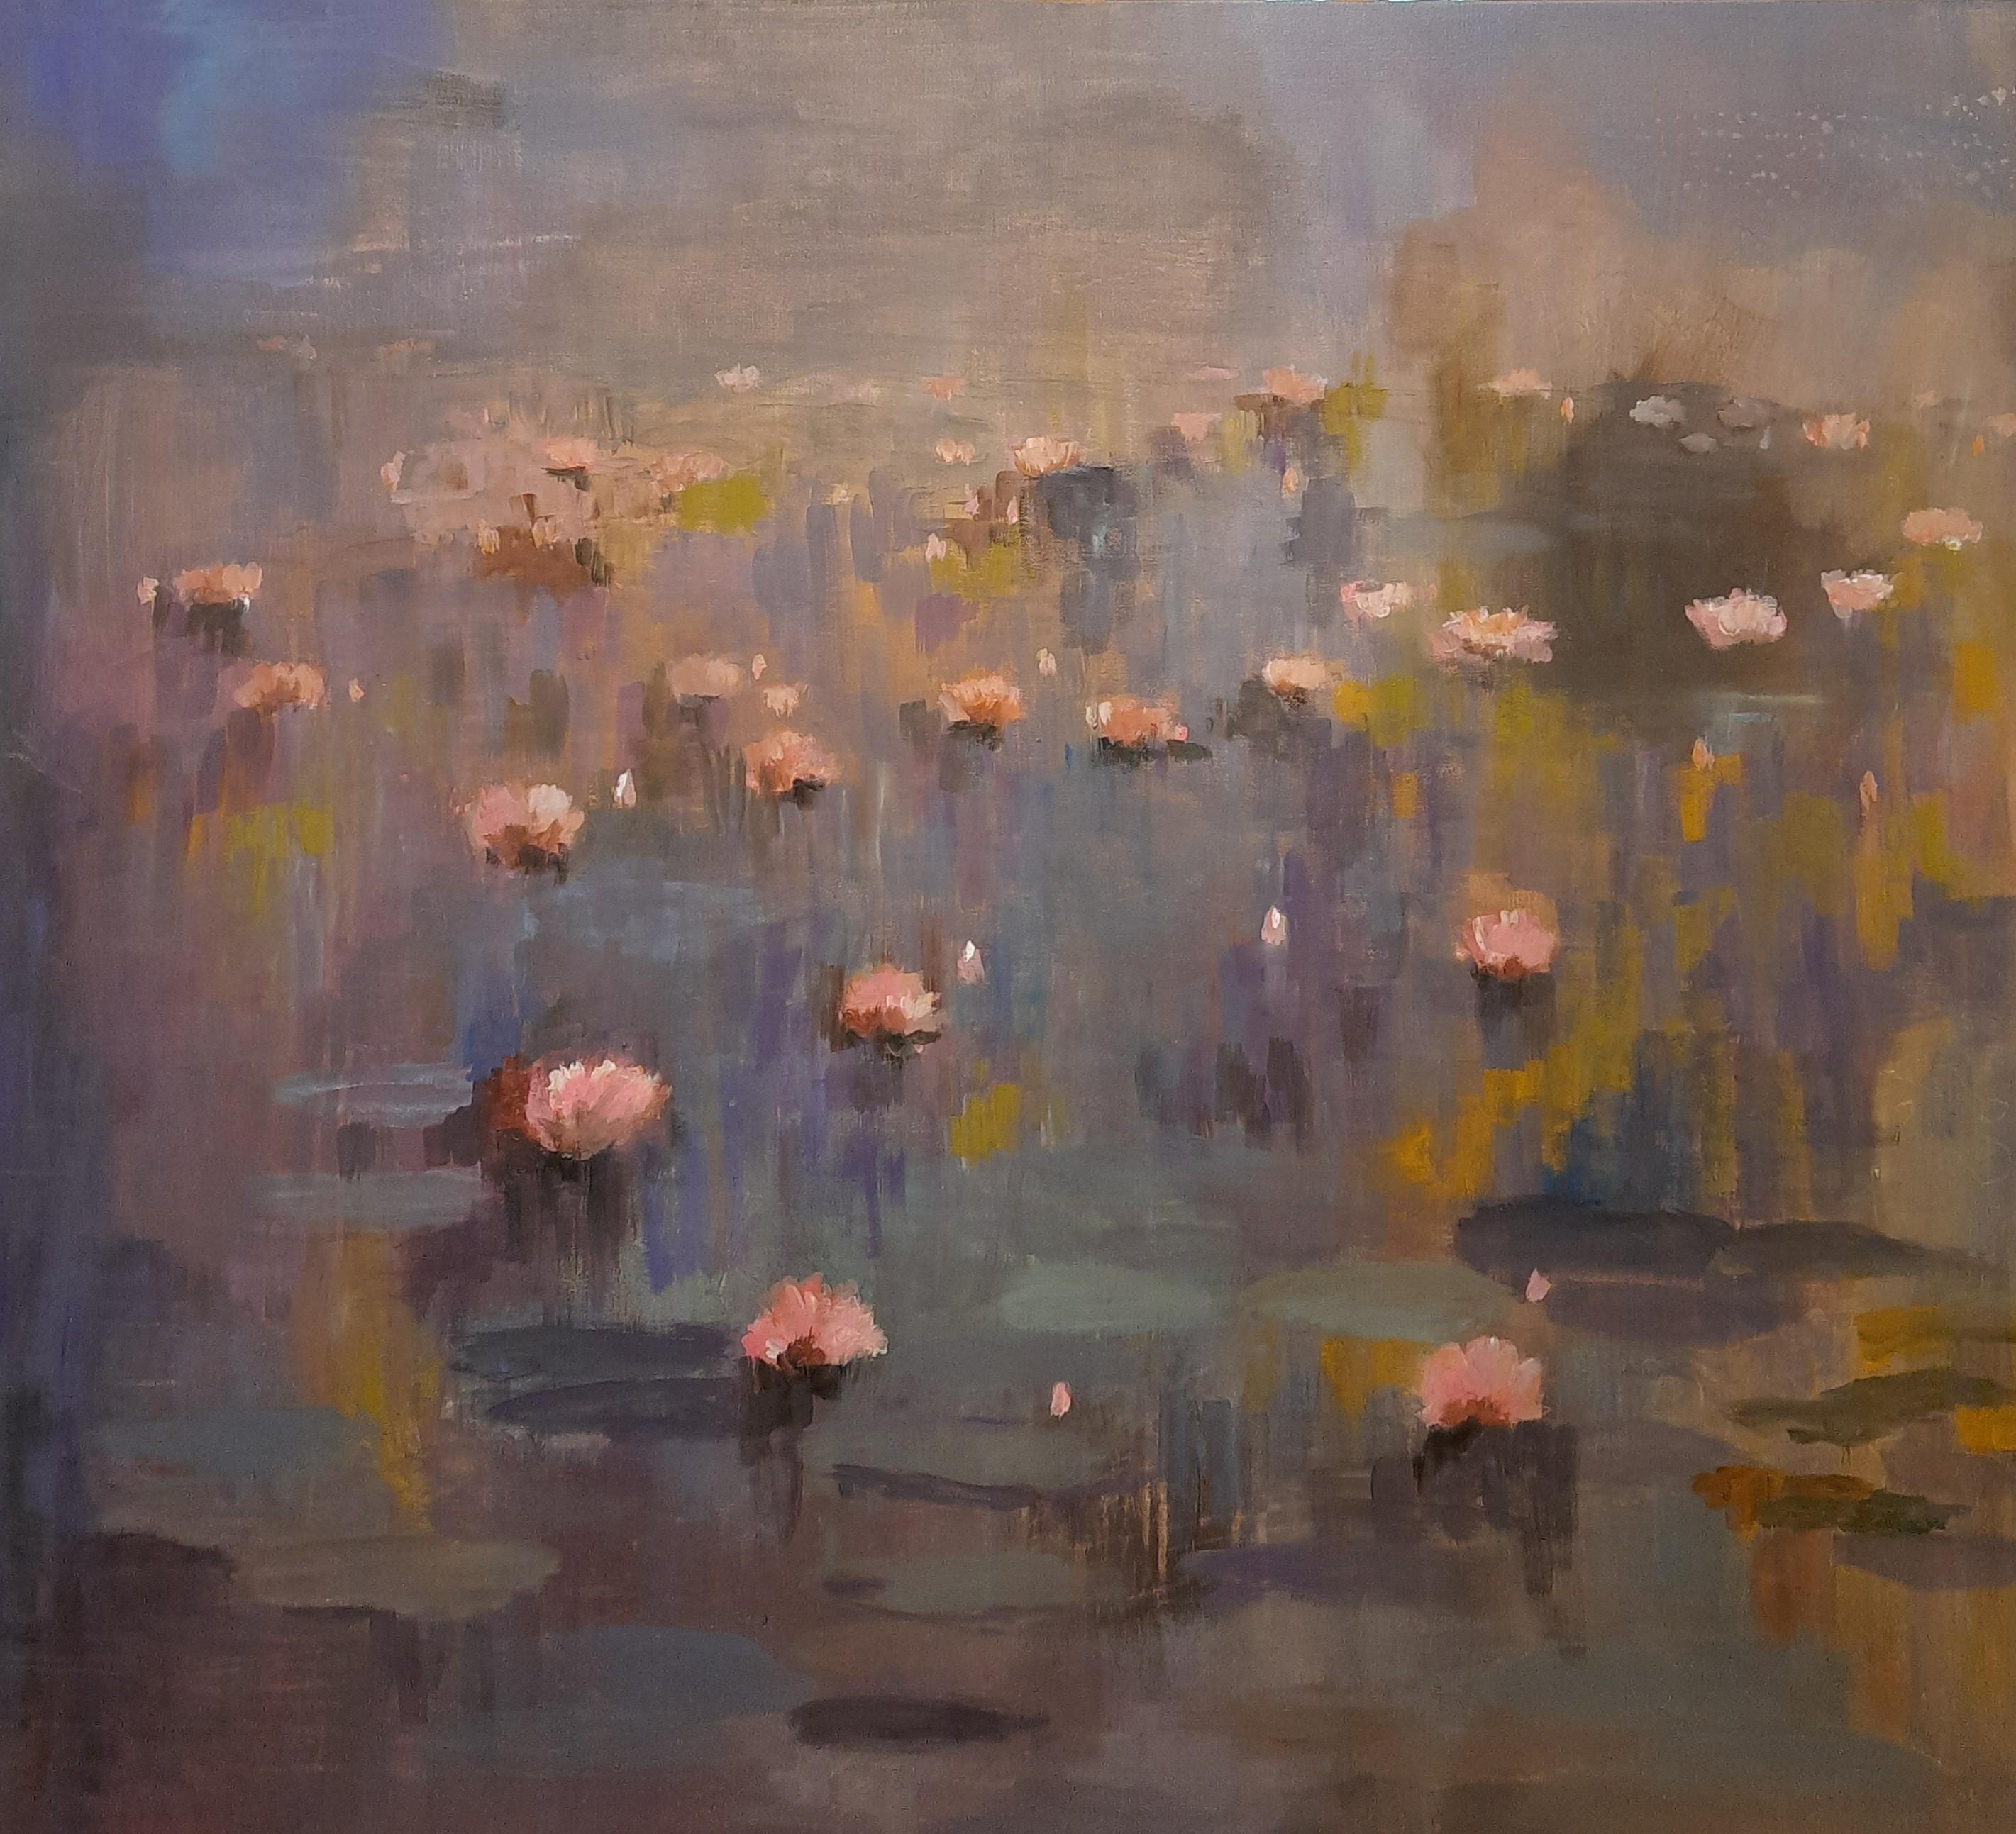 Floating bloomers by Jean wijesekera